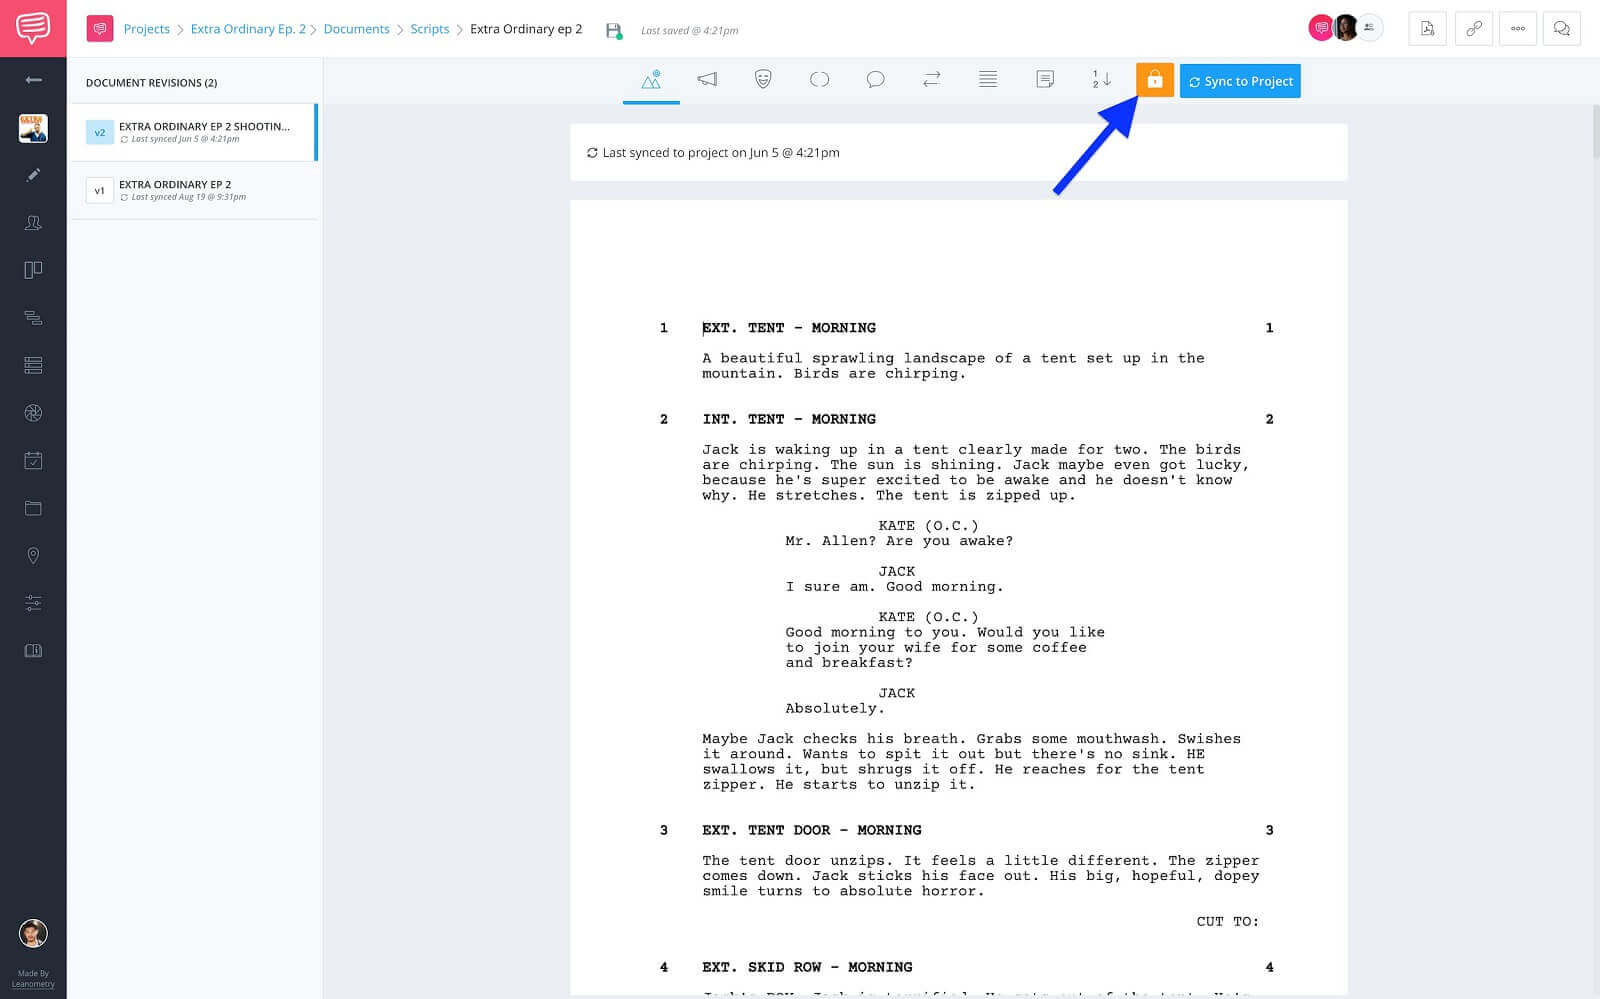 Screenwriting Page - Locked Script